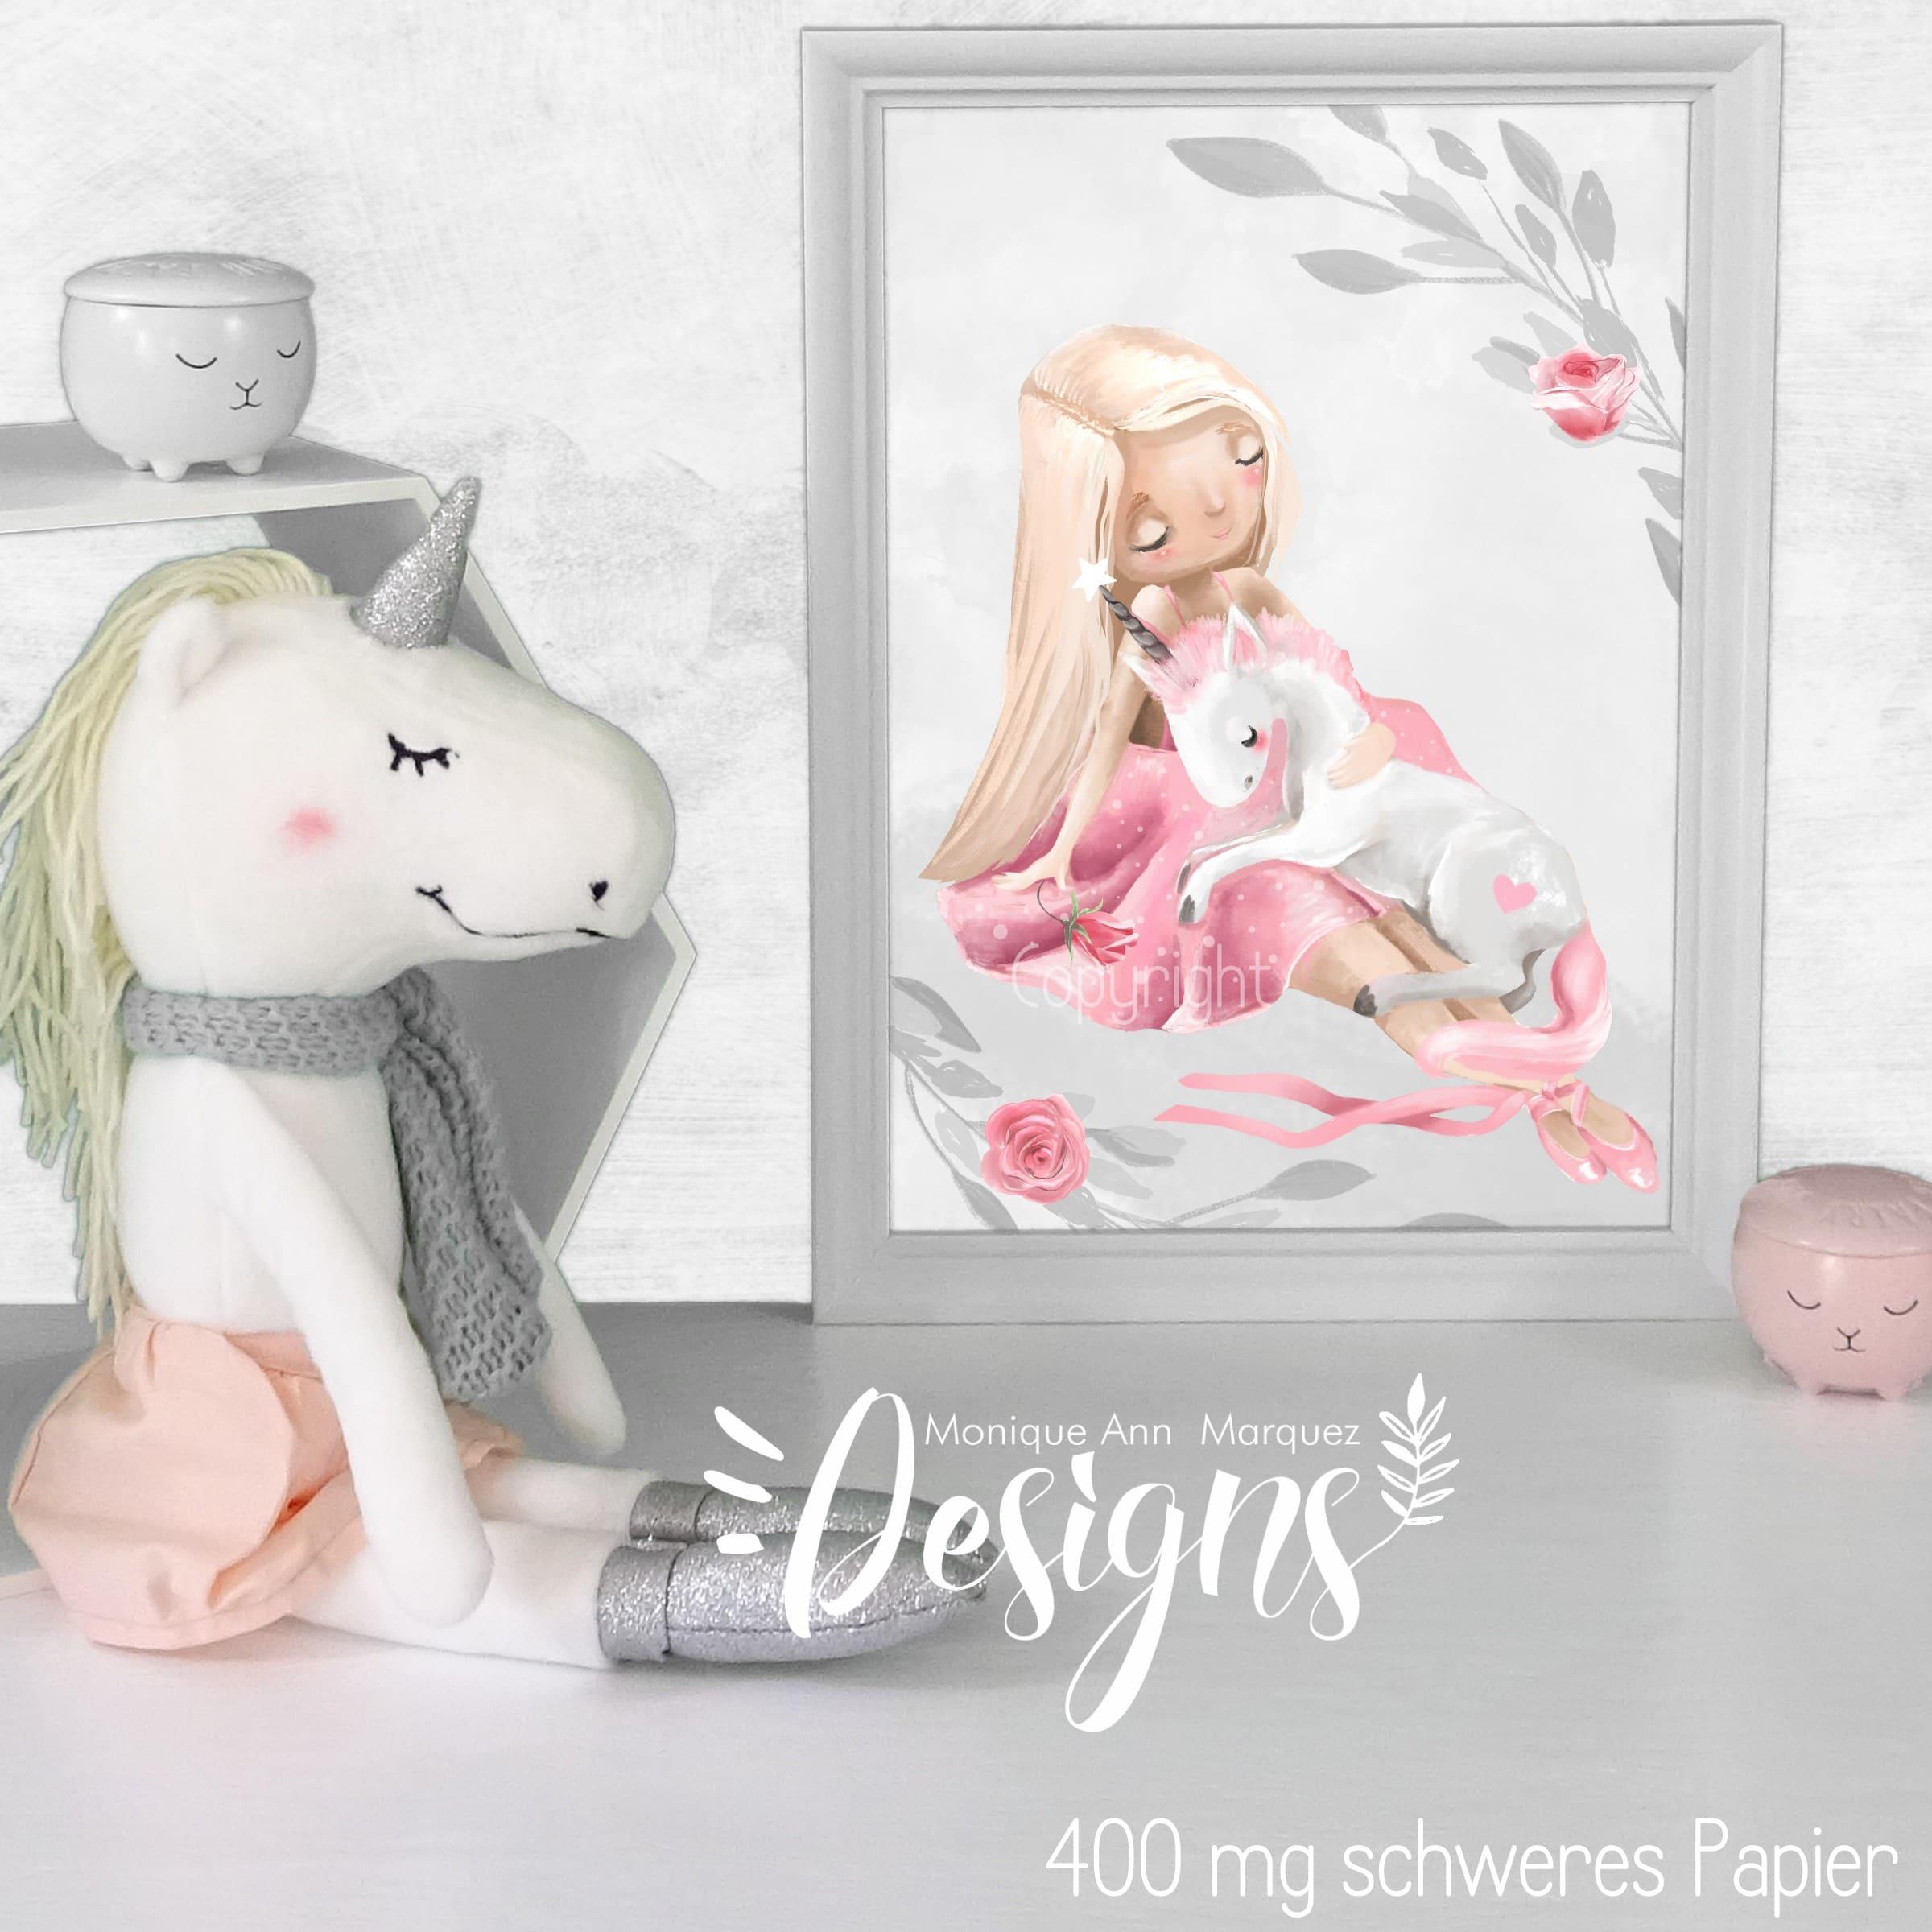 kinderzimmer bilder set tiere prinzessin ballerina baby. Black Bedroom Furniture Sets. Home Design Ideas